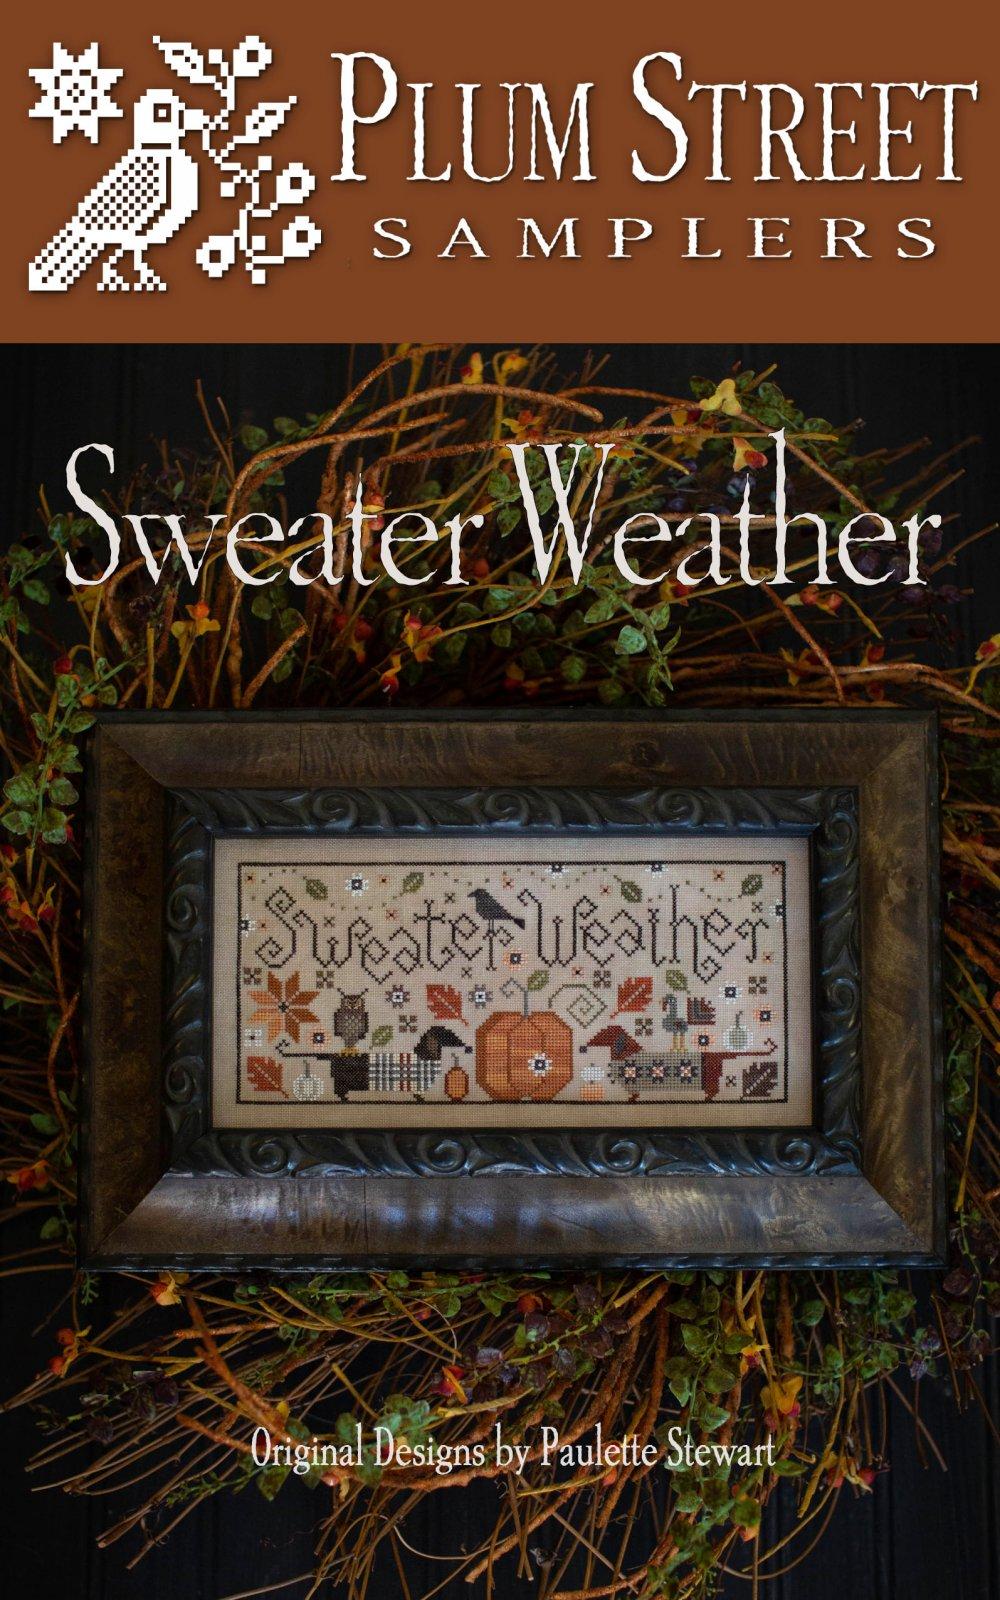 Sweater Weather ~ Plum Street Samplers